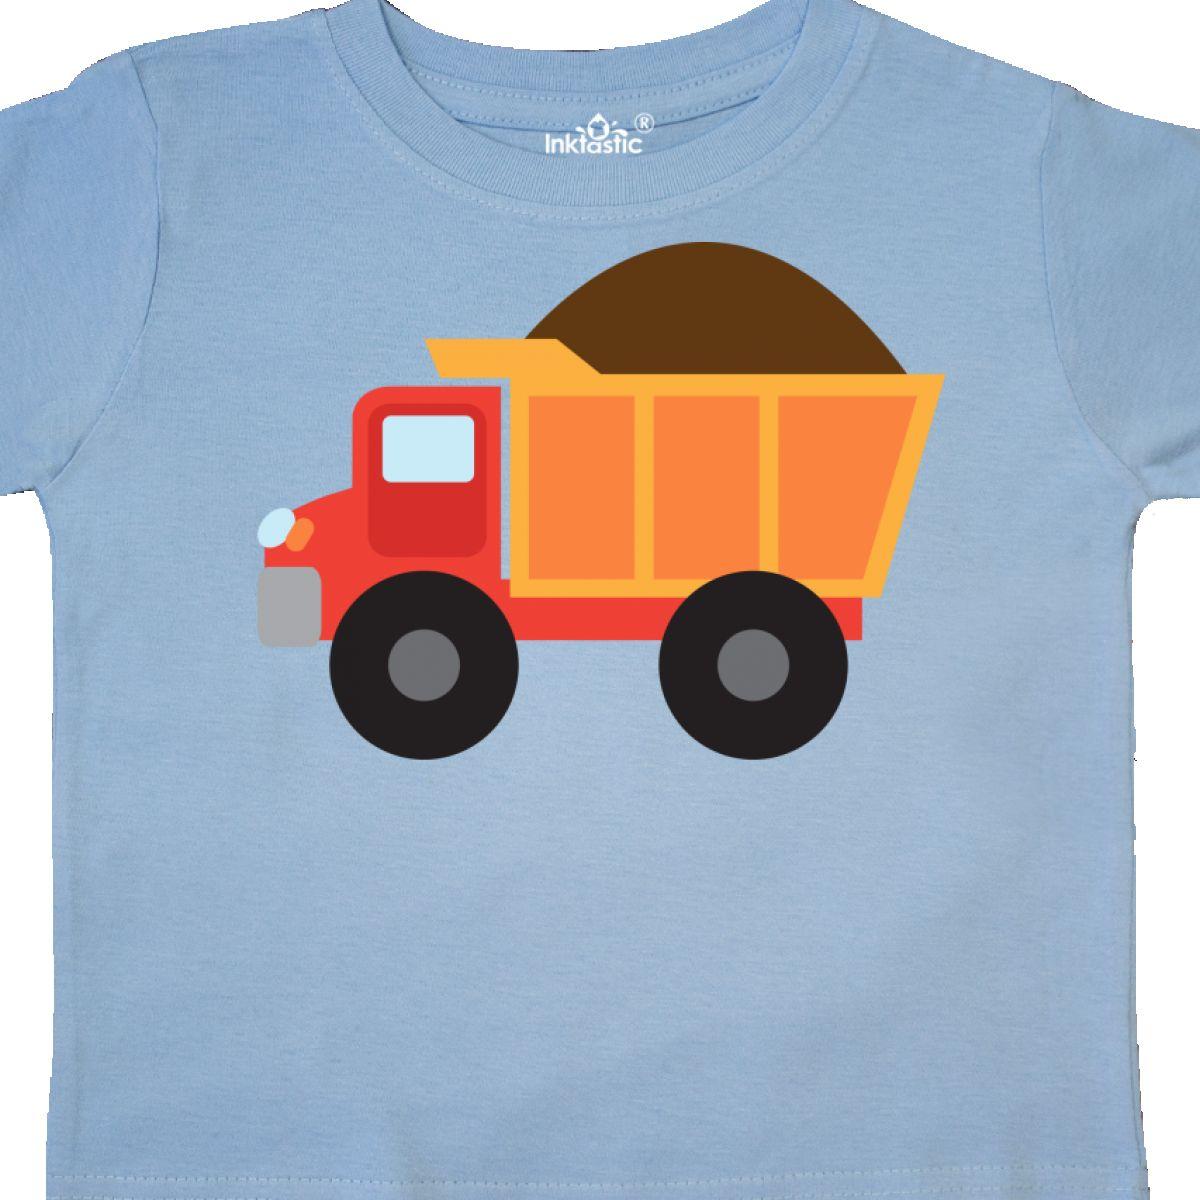 Inktastic-Work-Truck-Construction-Vehicle-Toddler-T-Shirt-Trucks-Vehicles-Cute thumbnail 20